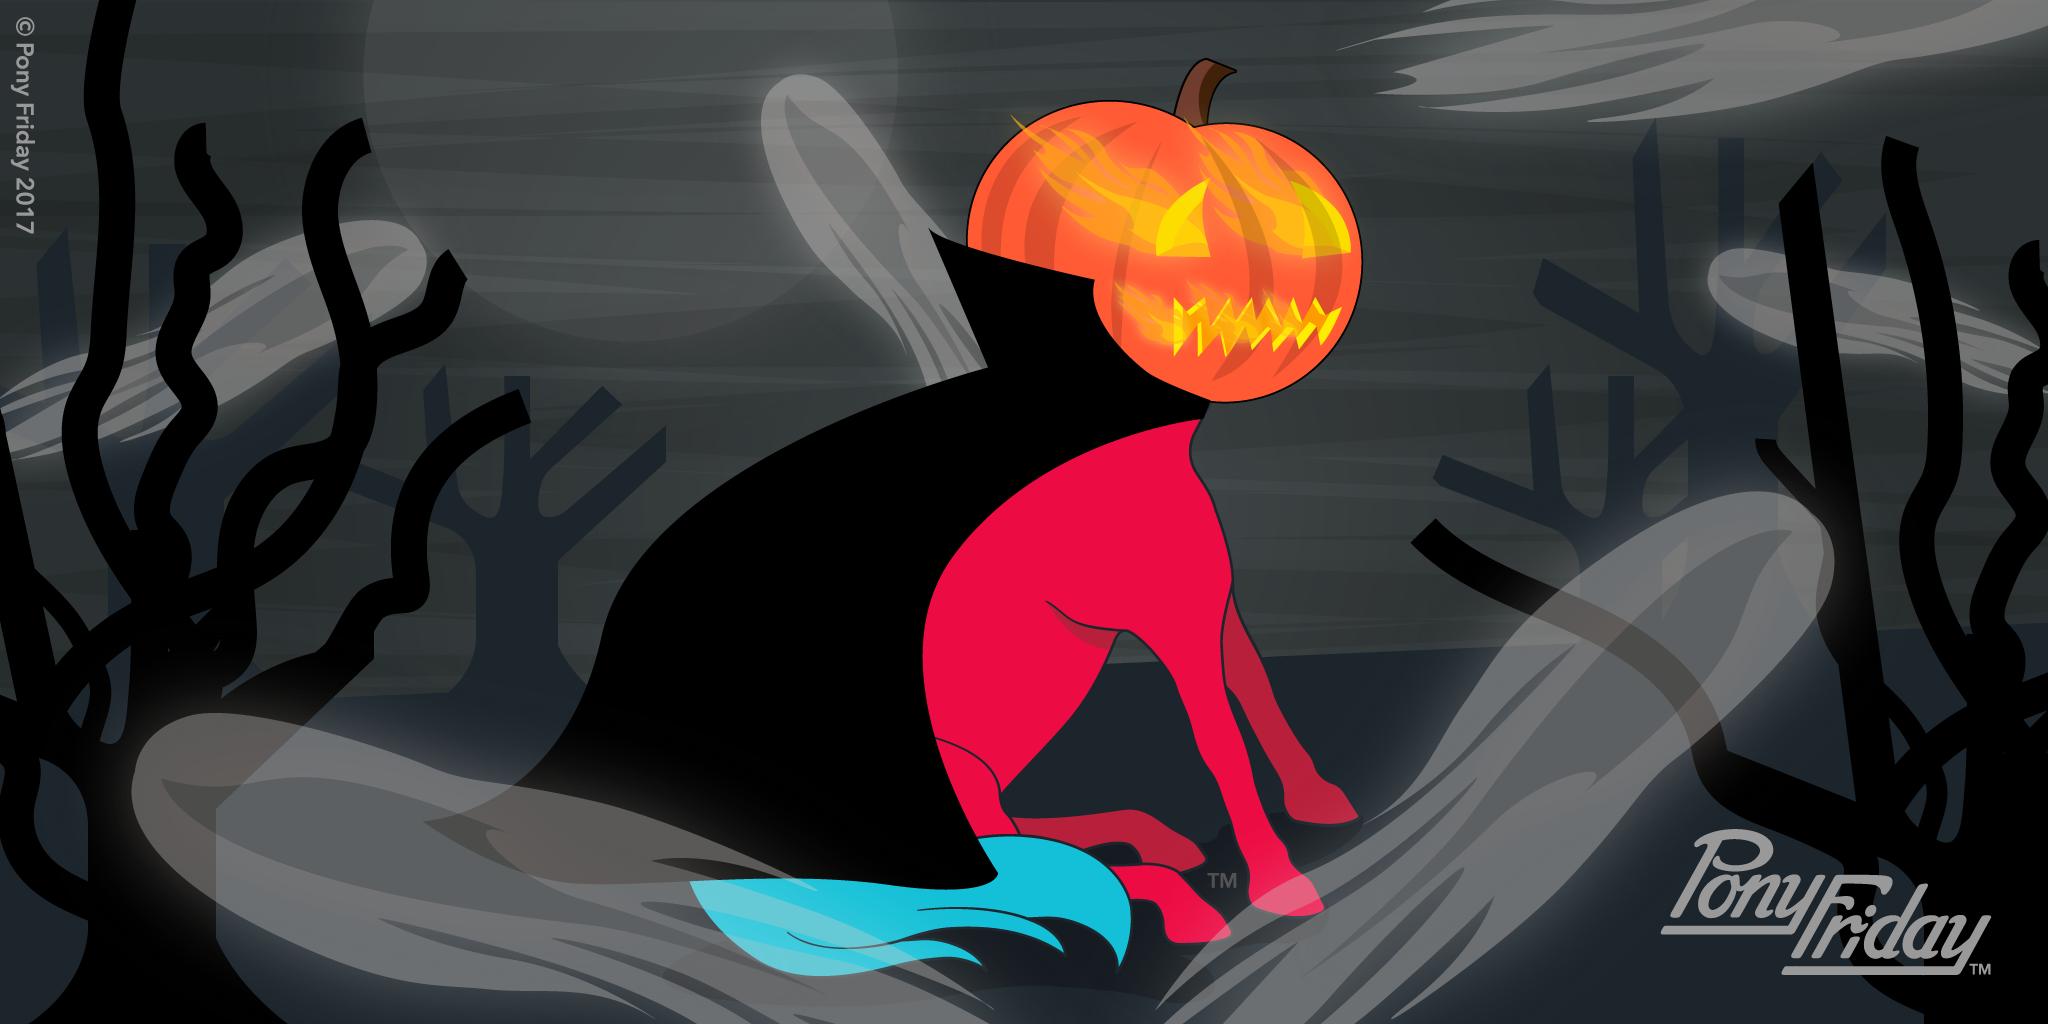 Pony-Friday-Fear-Halloween-Headless-Horseman-Kicks-Blog-Header-Image.png